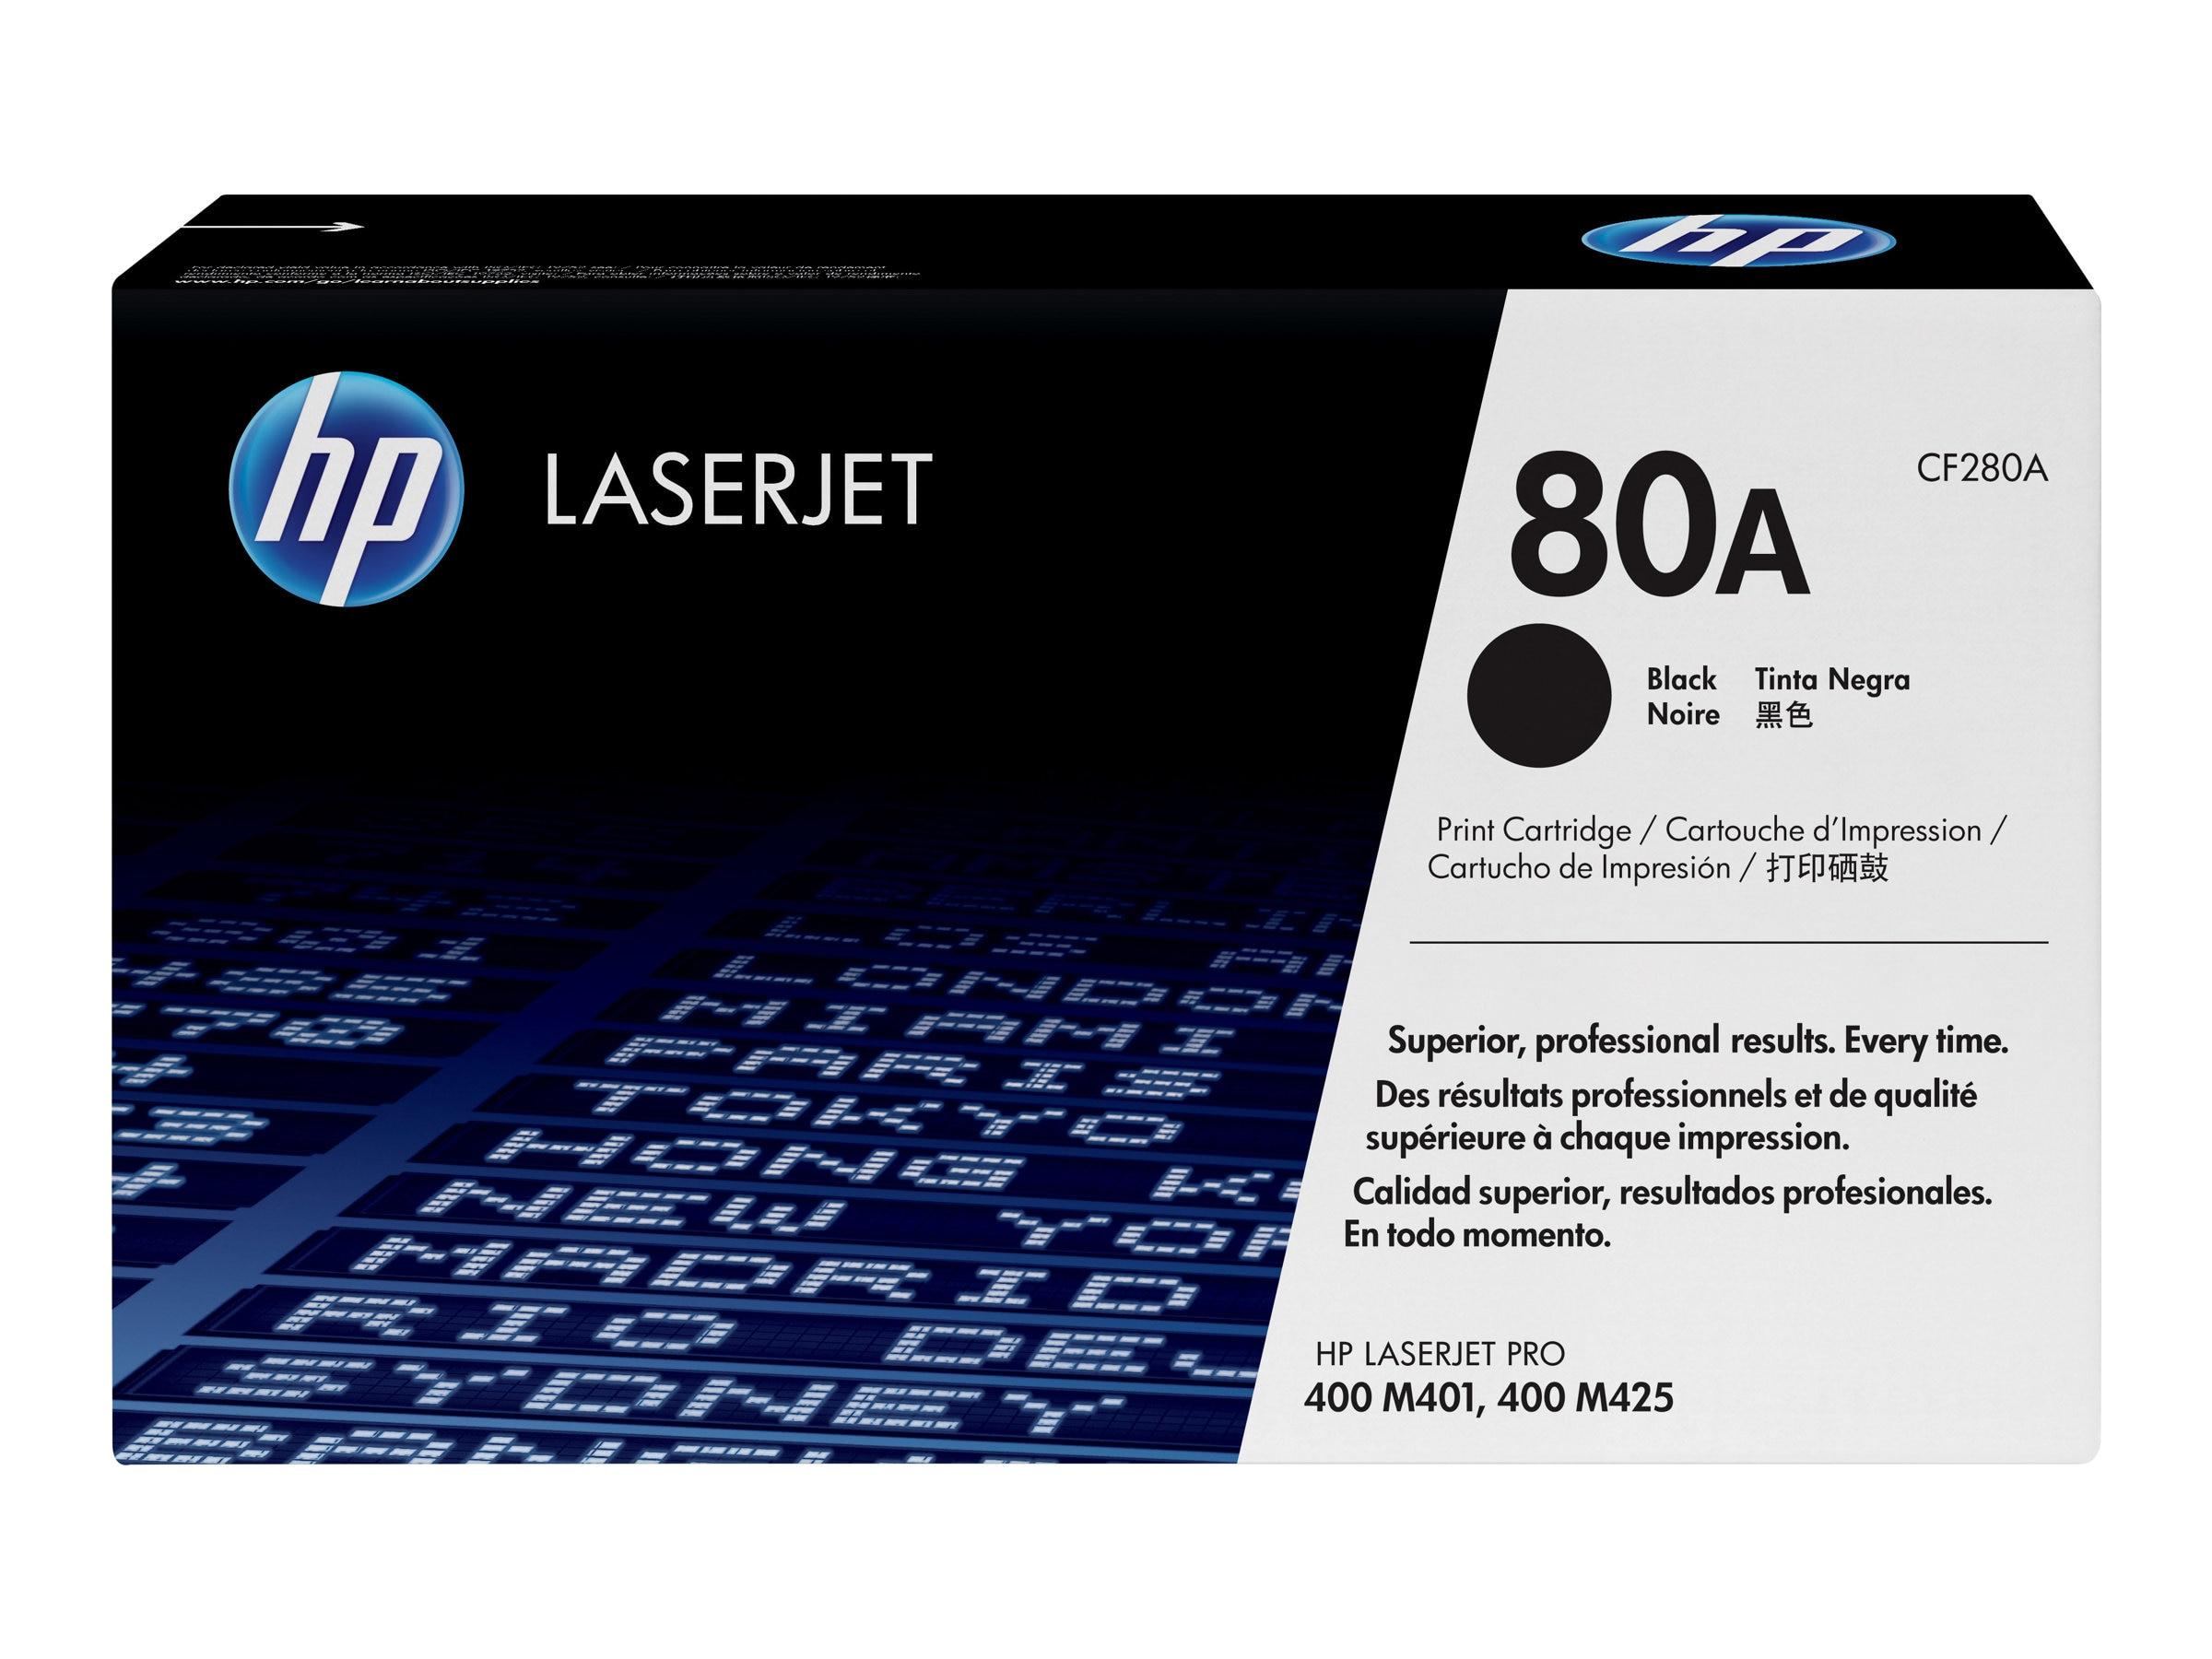 HP 80A (CF280A) Black Original LaserJet Toner Cartridge for HP LaserJet Pro 400 M401 Series